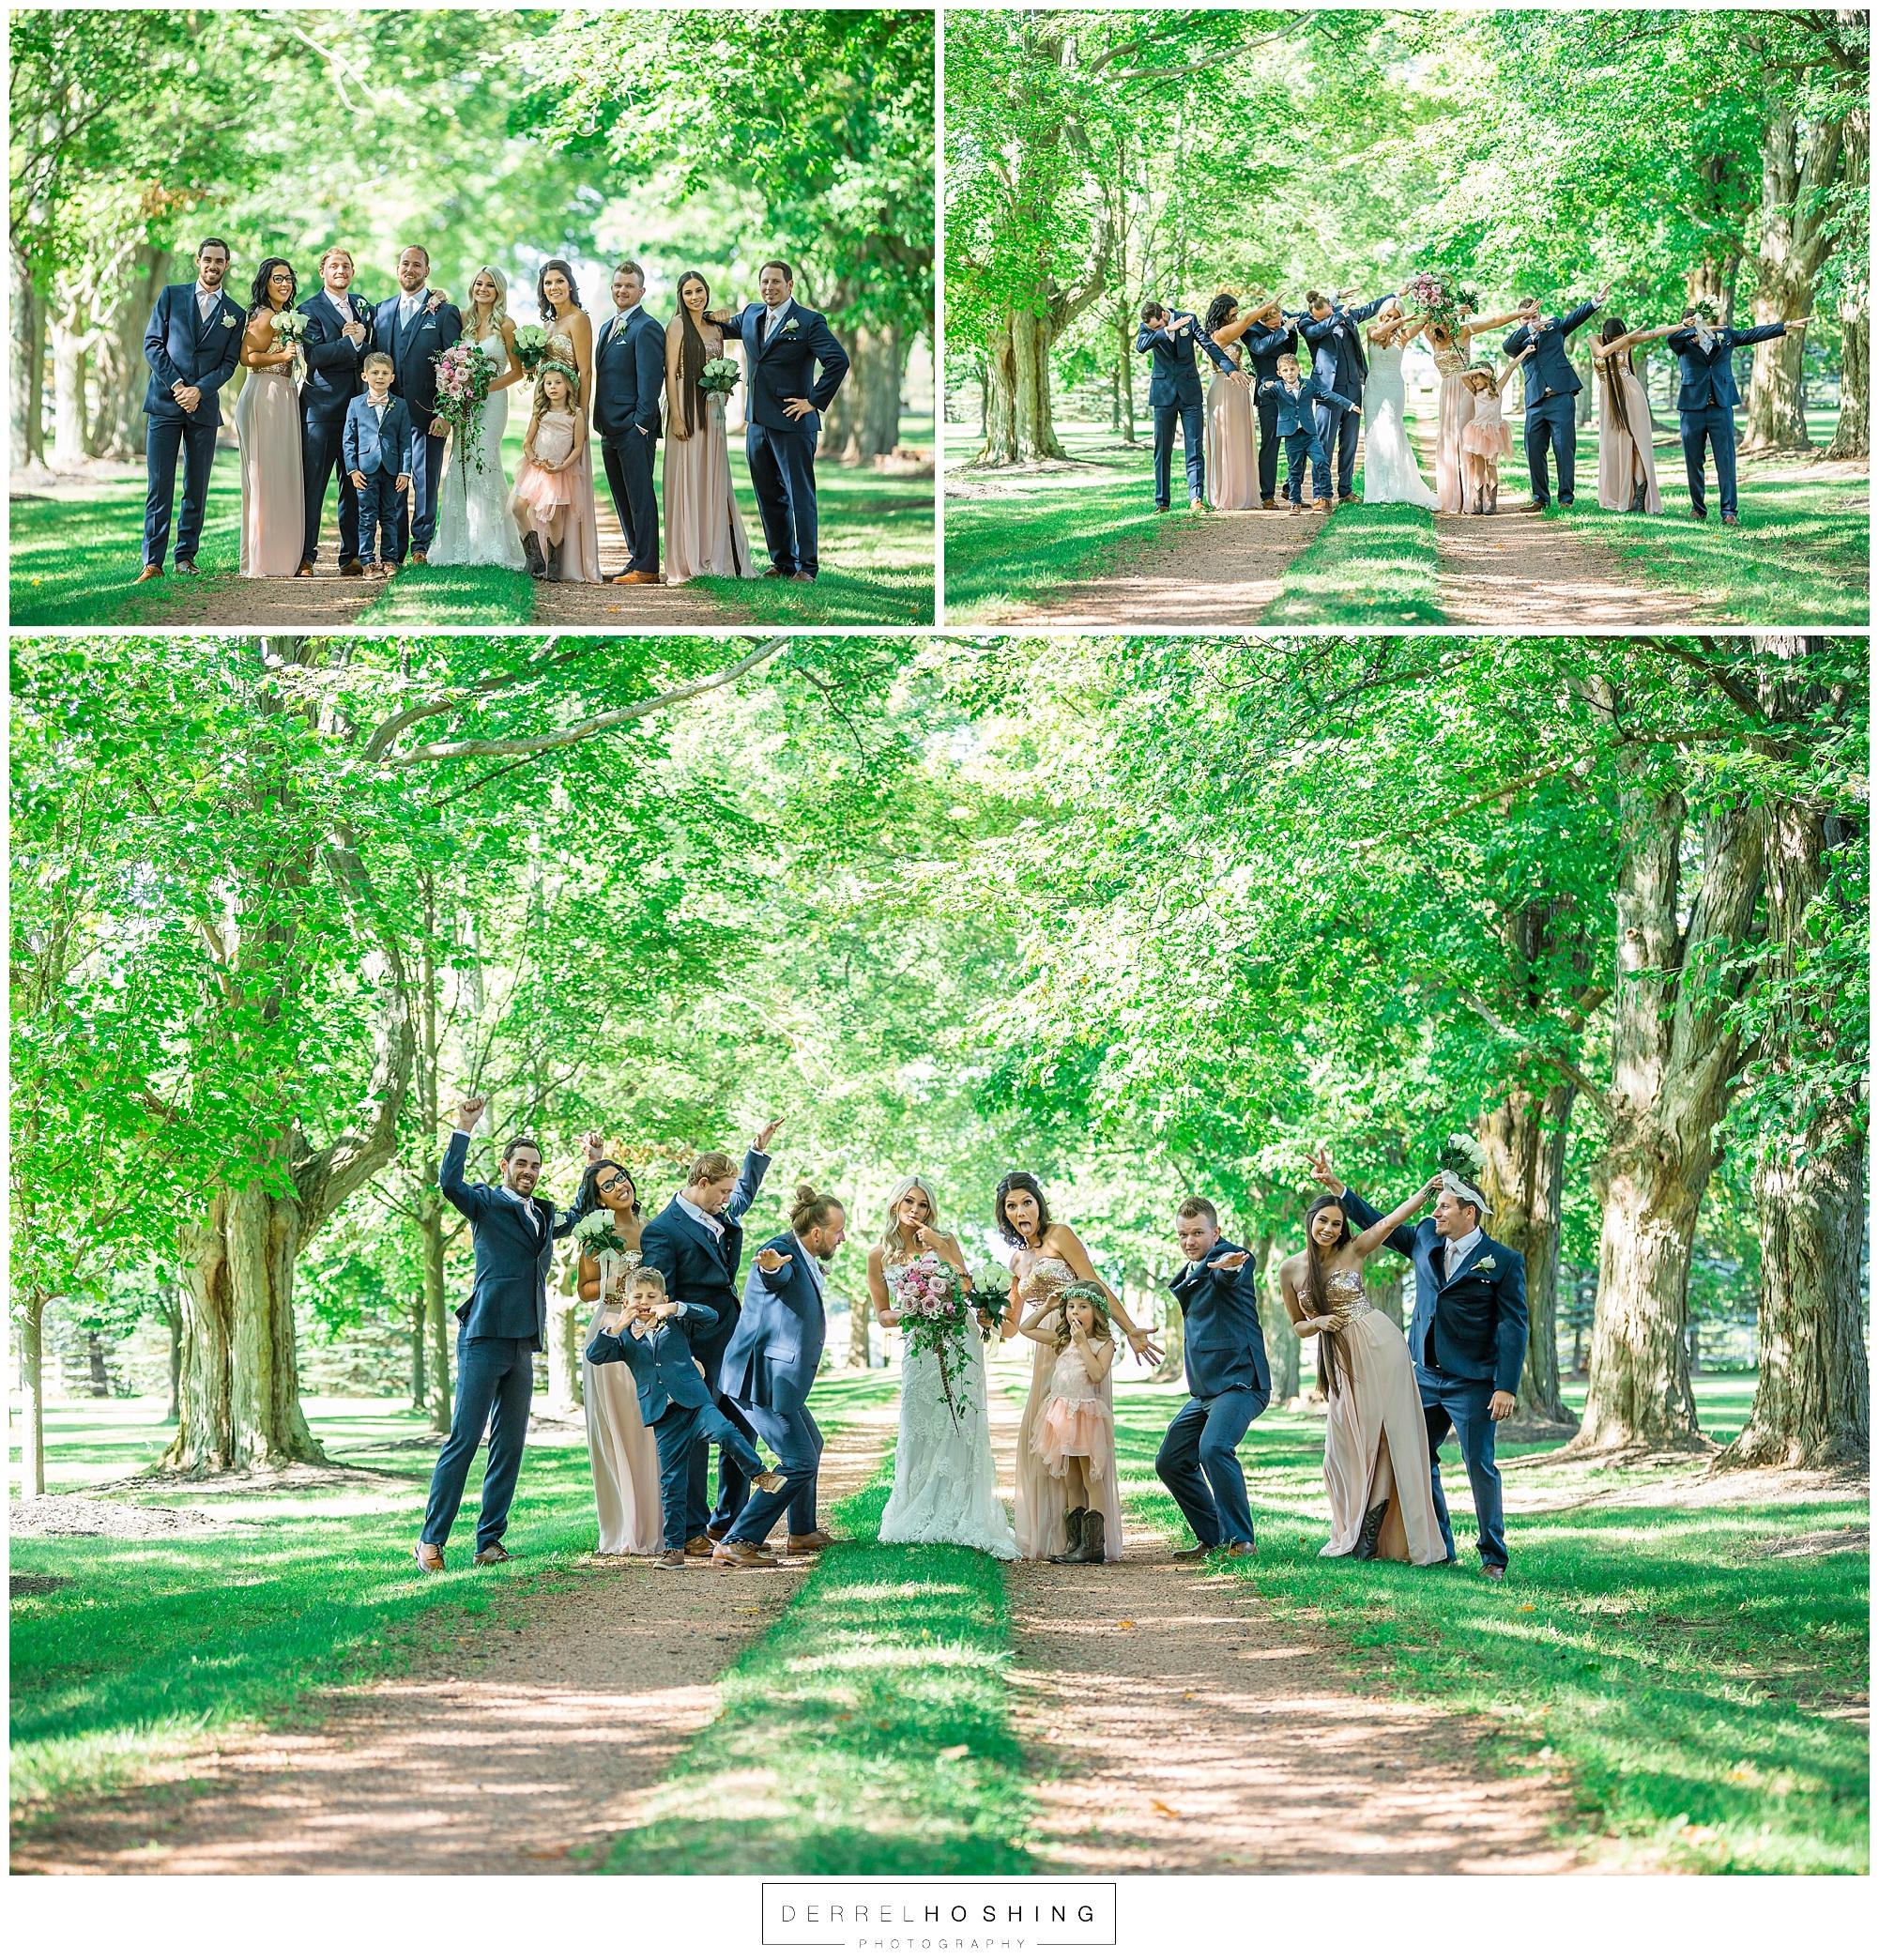 Belcroft-Estates-&-Event-Centre-Wedding-Innisfil-Ontario-0011.jpg